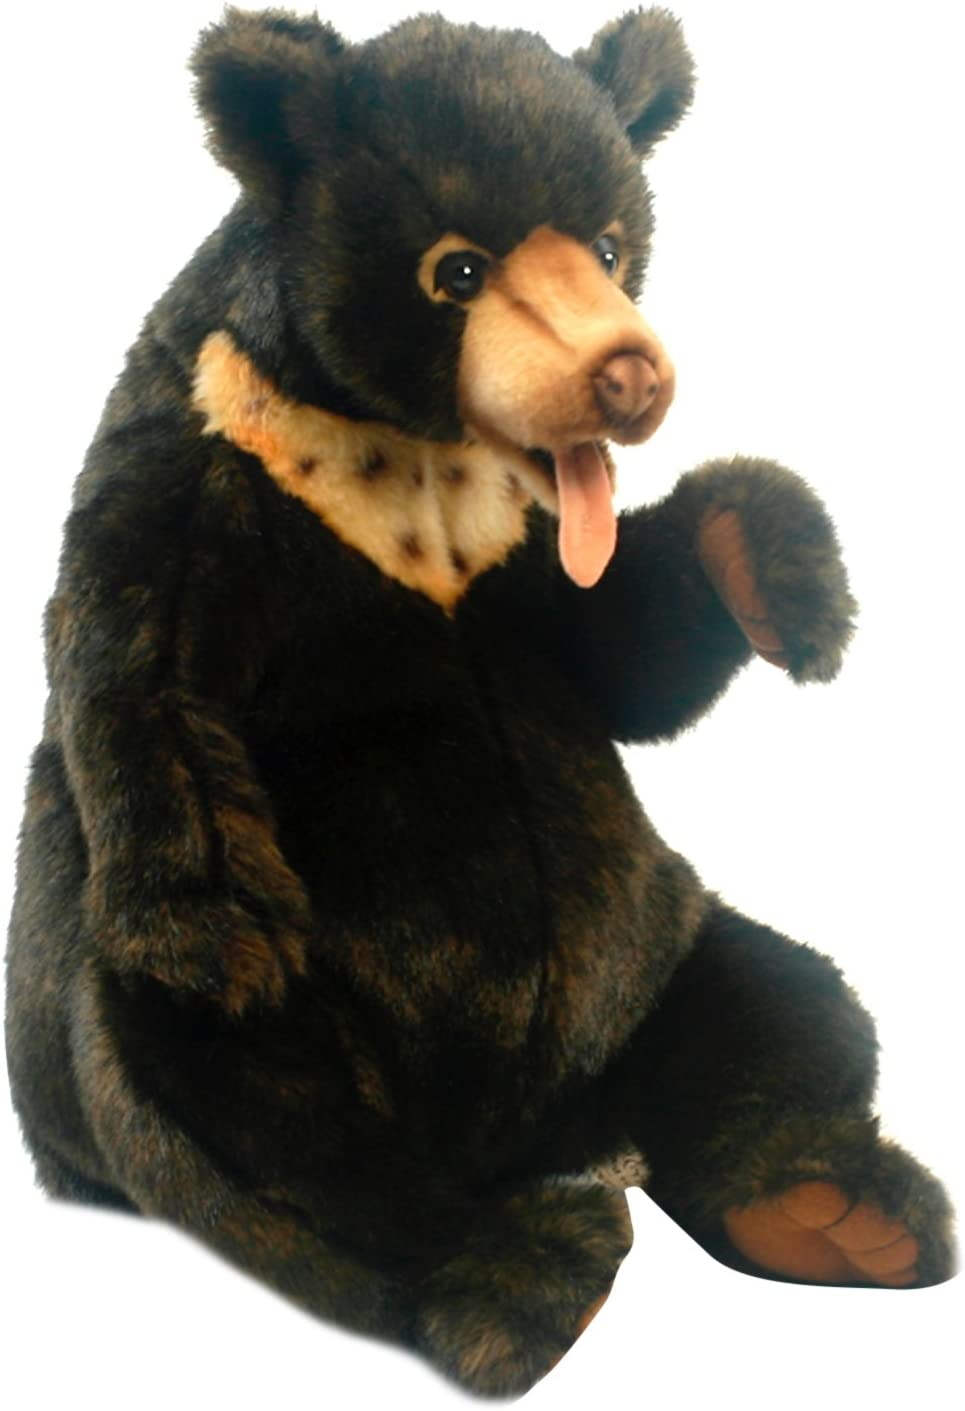 Sunbear Stuffed Animal, Hansa 5232 28 Centimeter Sunbear Cub Sitting Plush Soft Toy Amazon Co Uk Toys Games